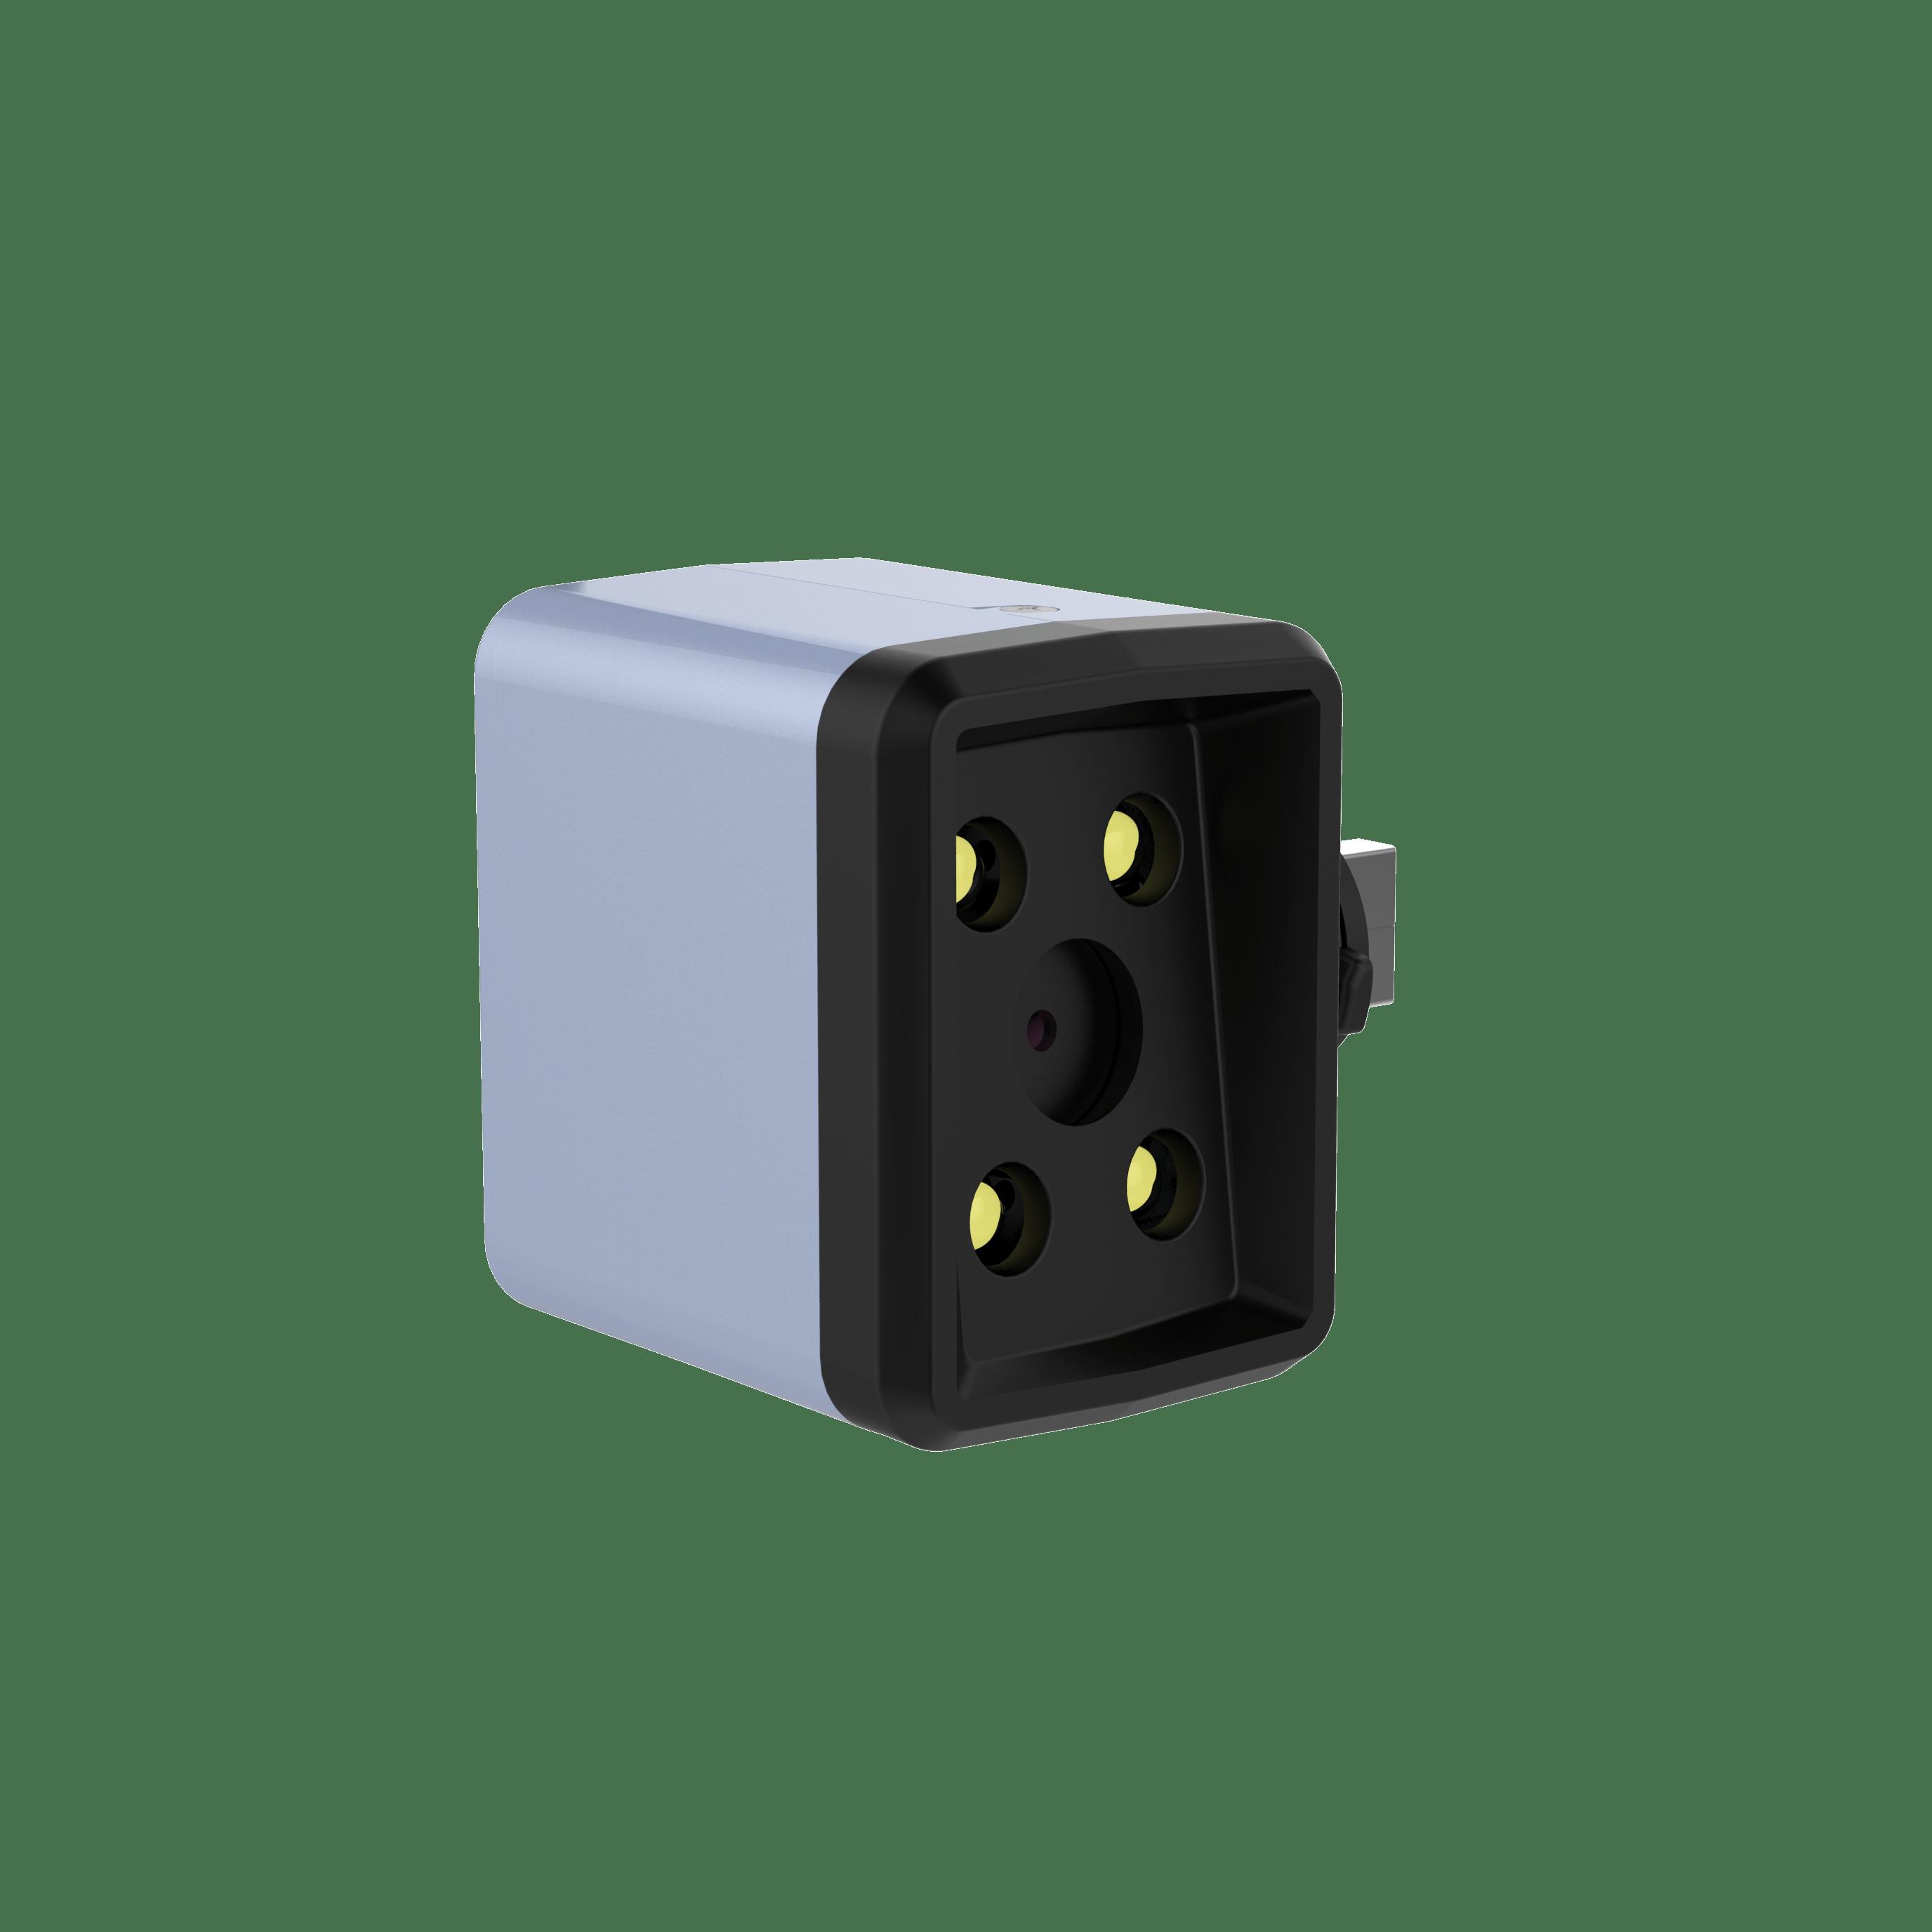 color-pack-einscan-2x-2020-vger